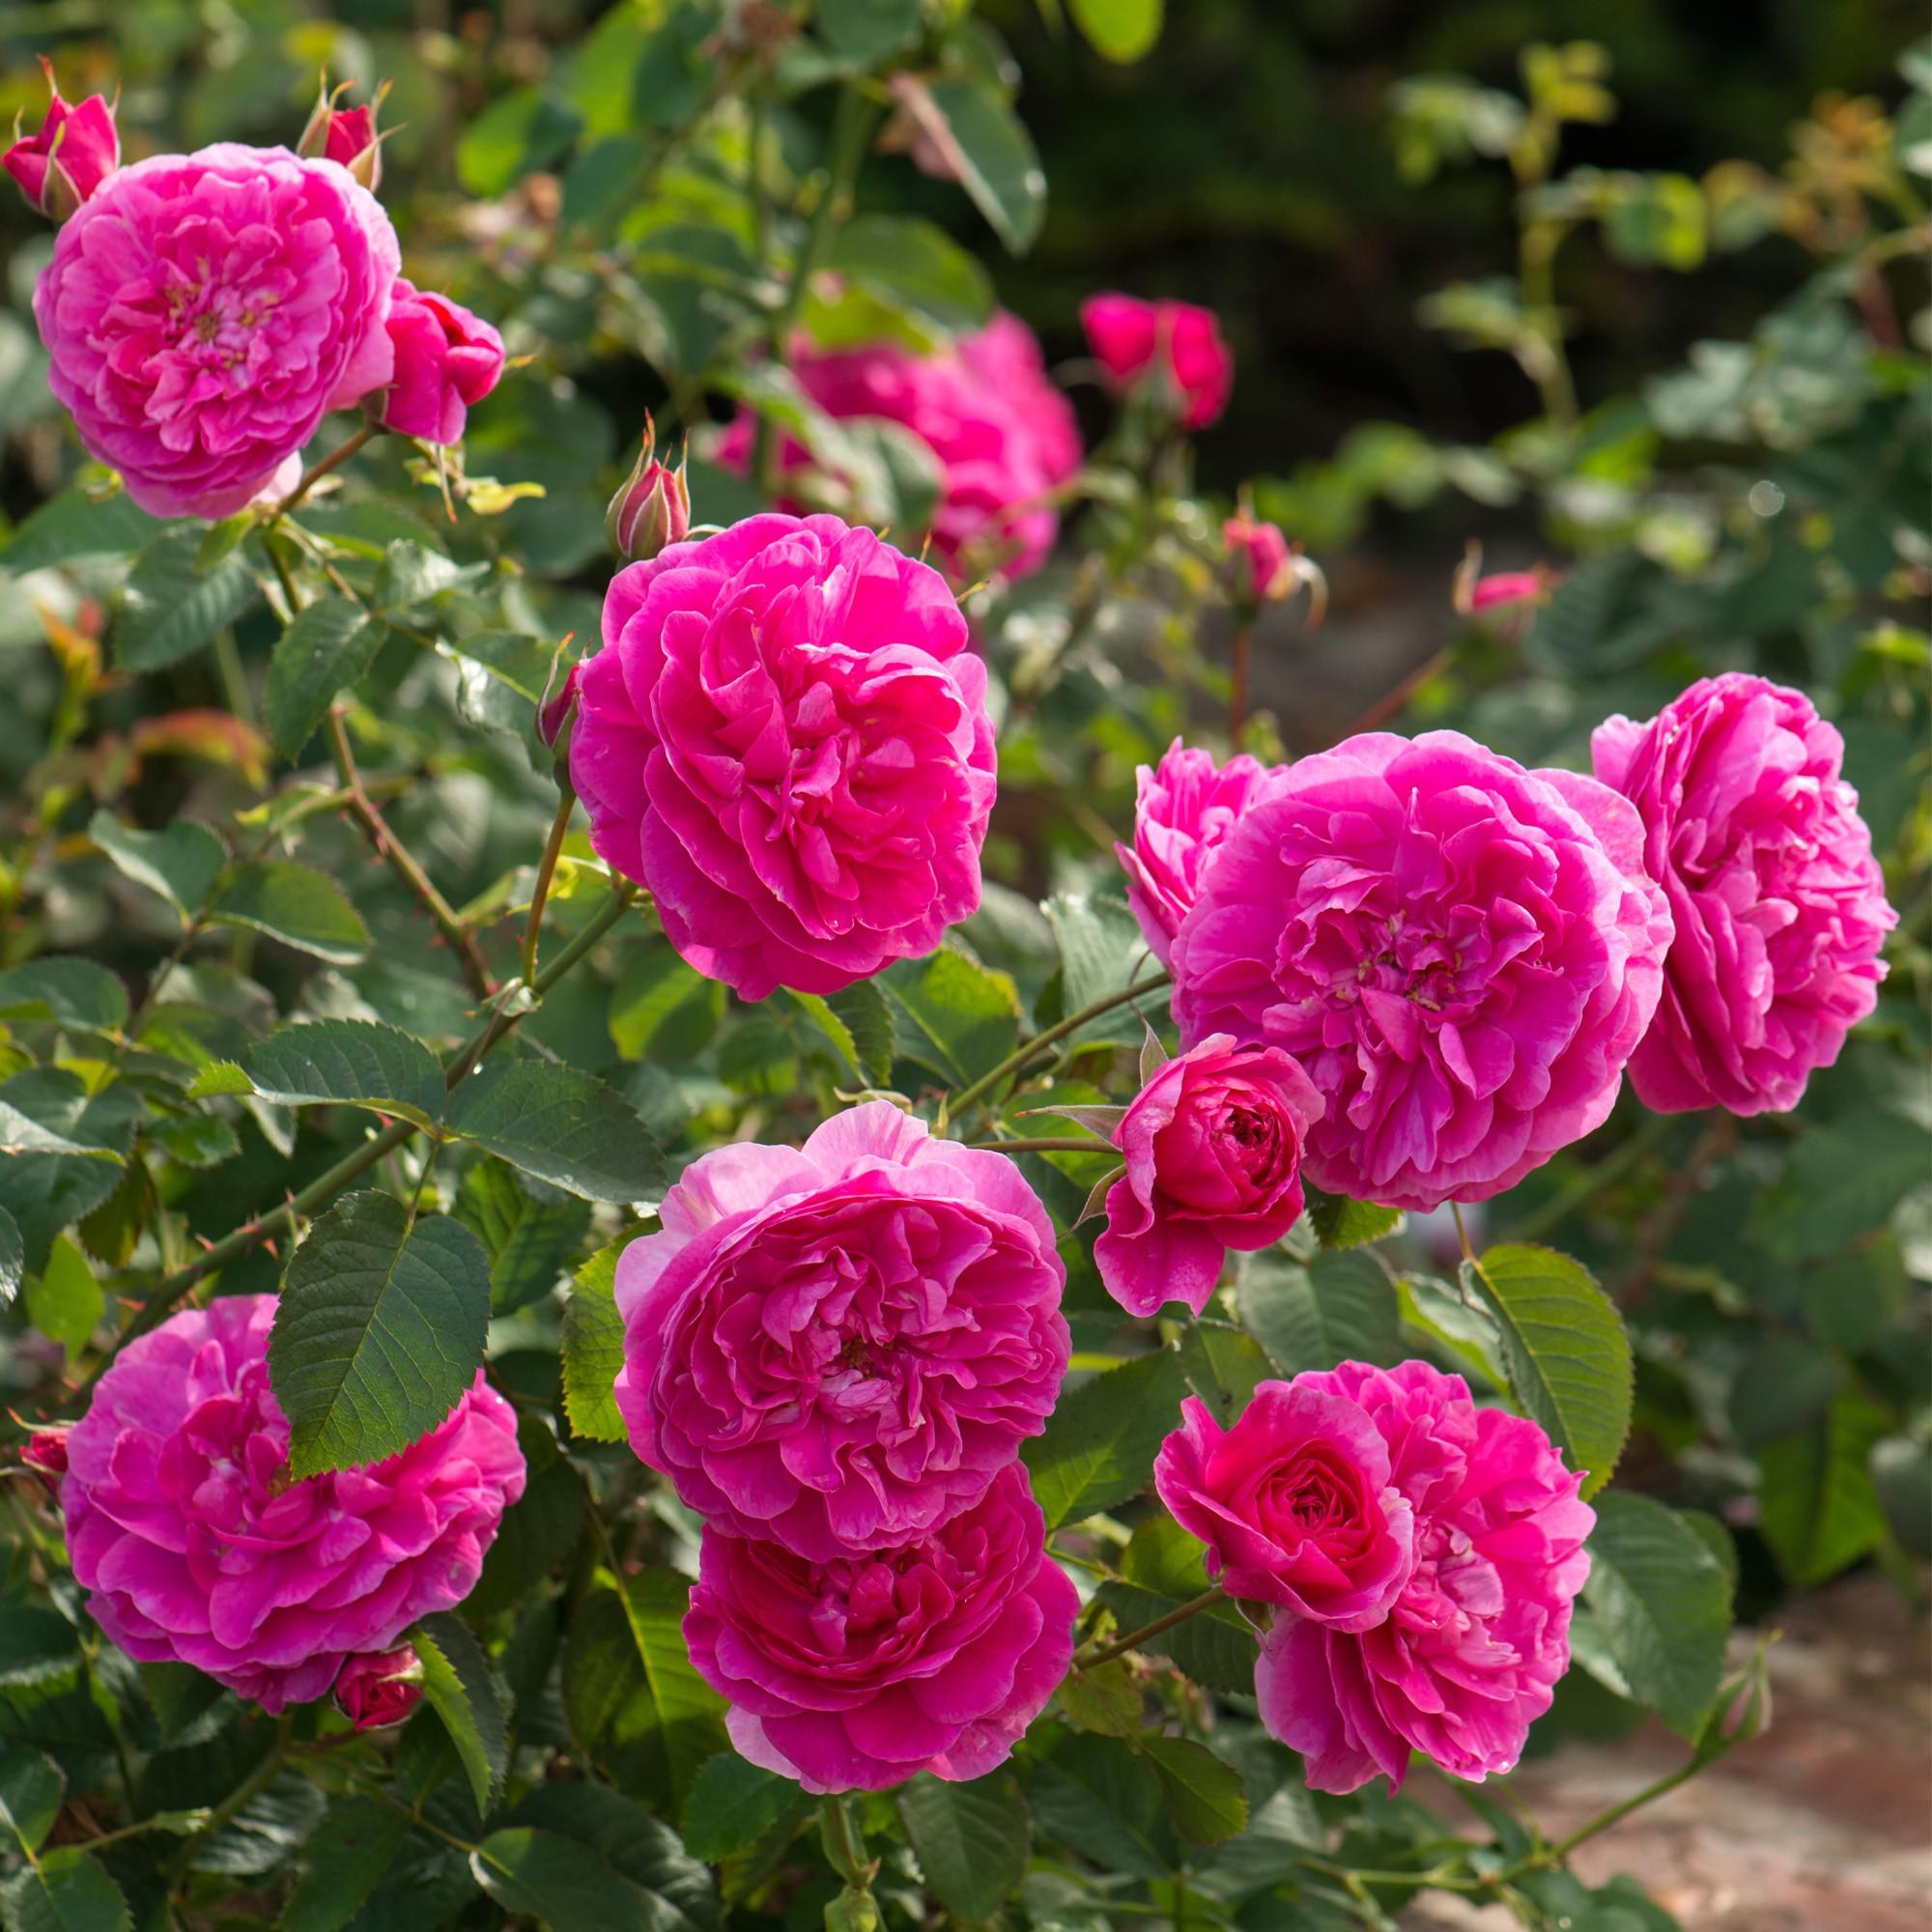 England_s_Rose_2_2